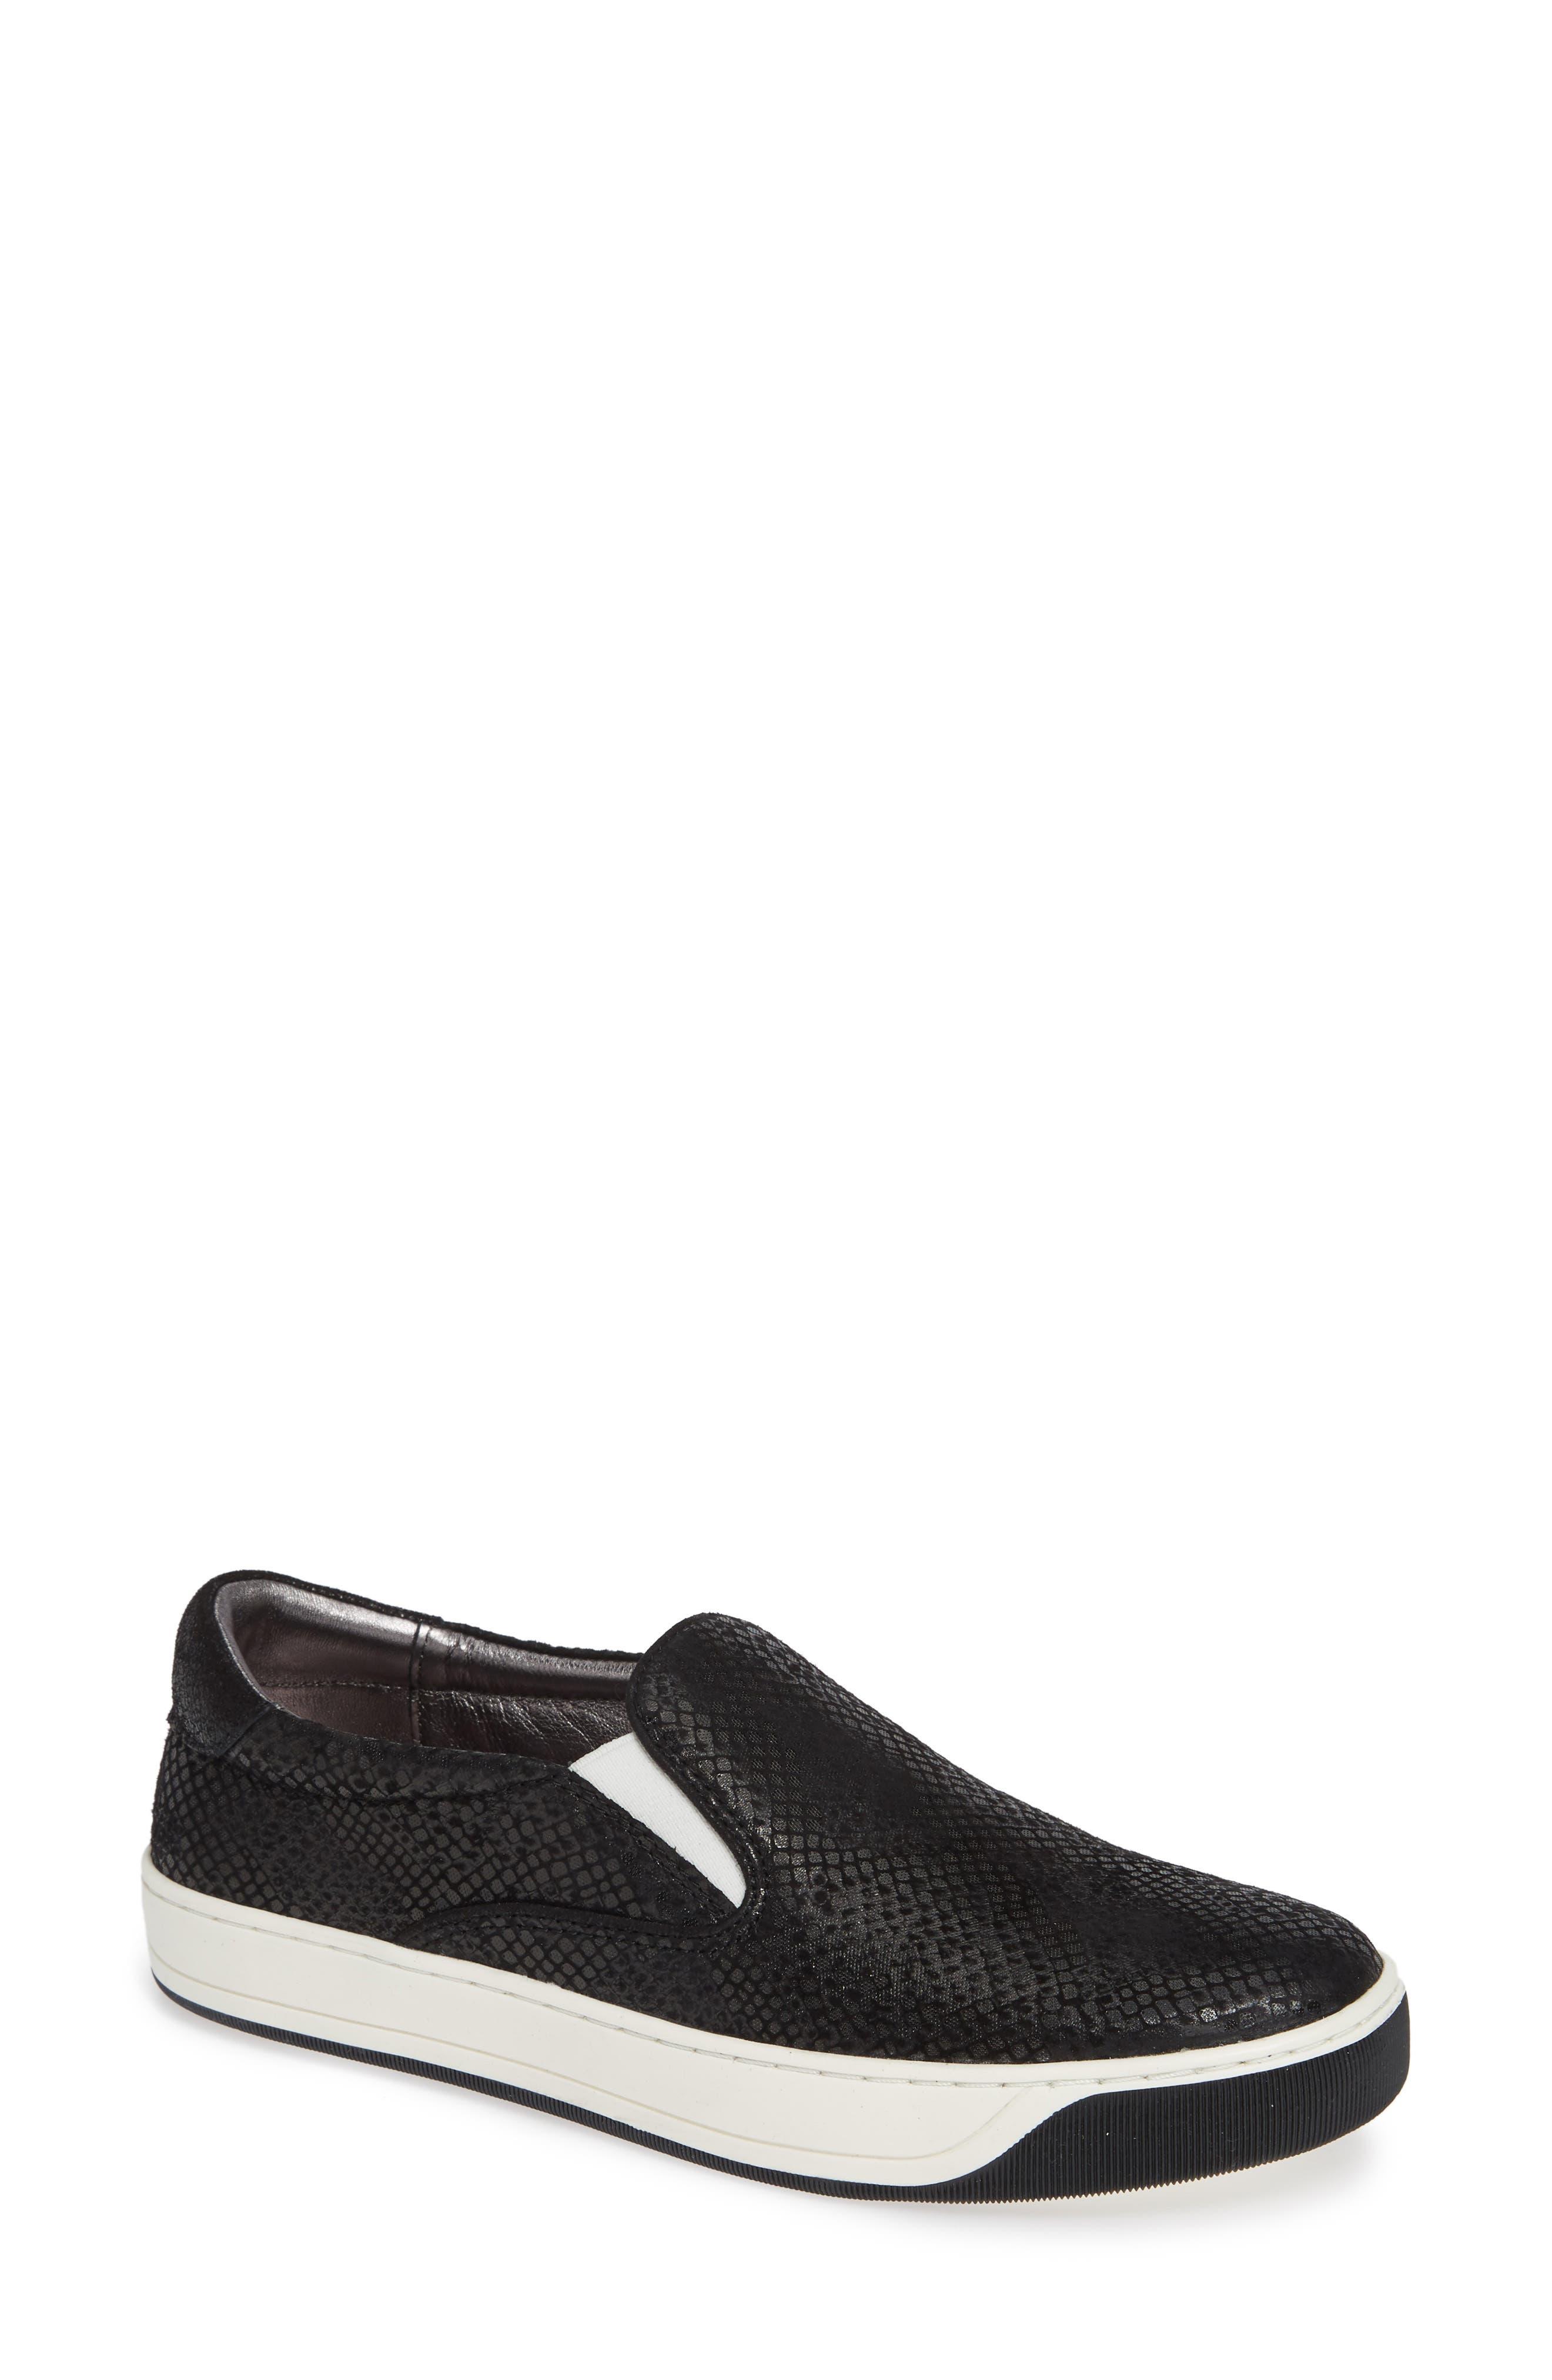 Elaine Slip-On Sneaker,                         Main,                         color, BLACK SNAKE PRINT SUEDE